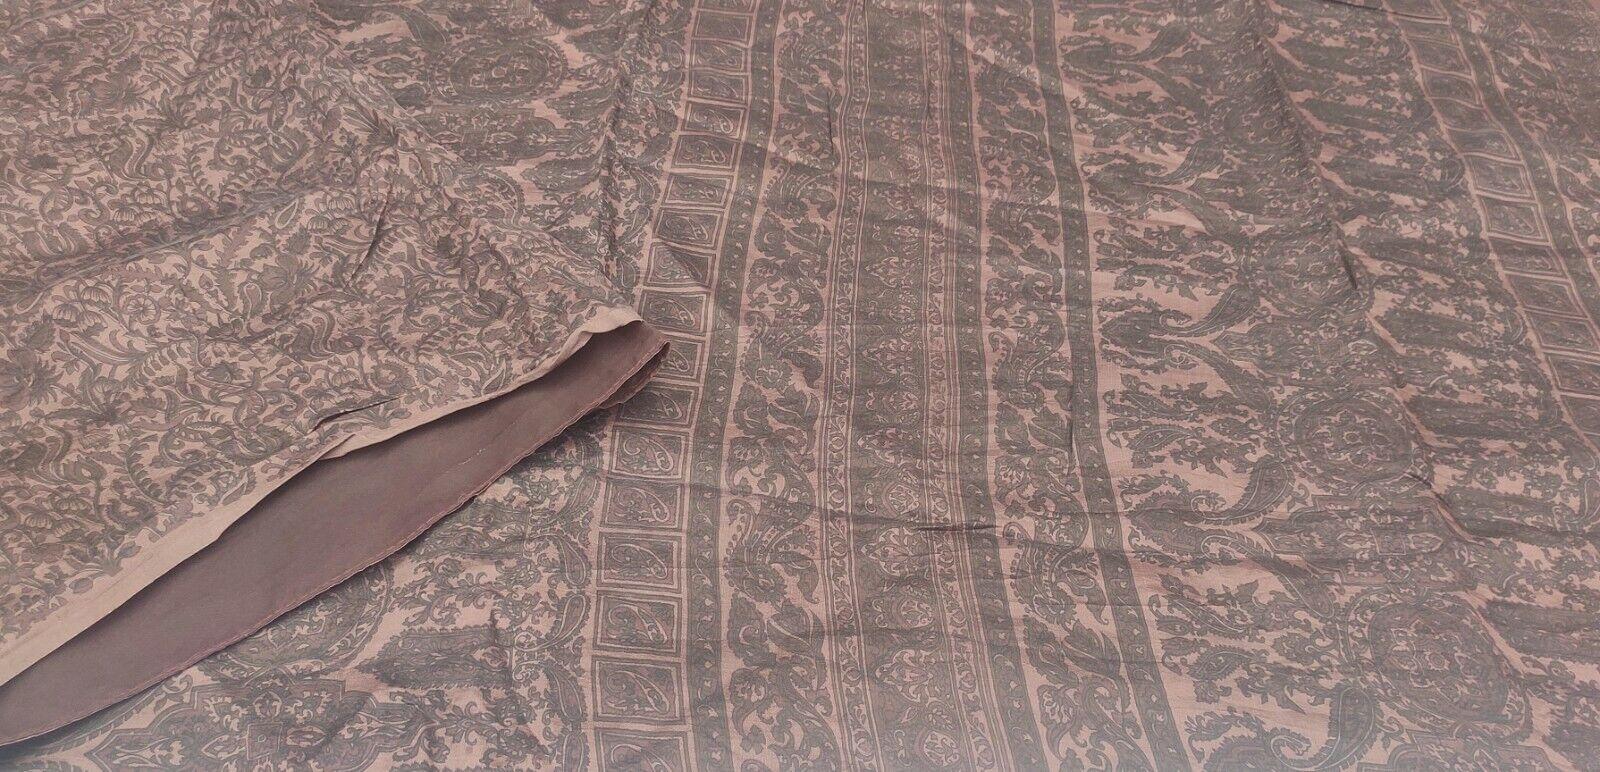 Dev Vintage Saree Pure Silk Printed Used Ethnc Floral Craft Sari Fabric DG-1223